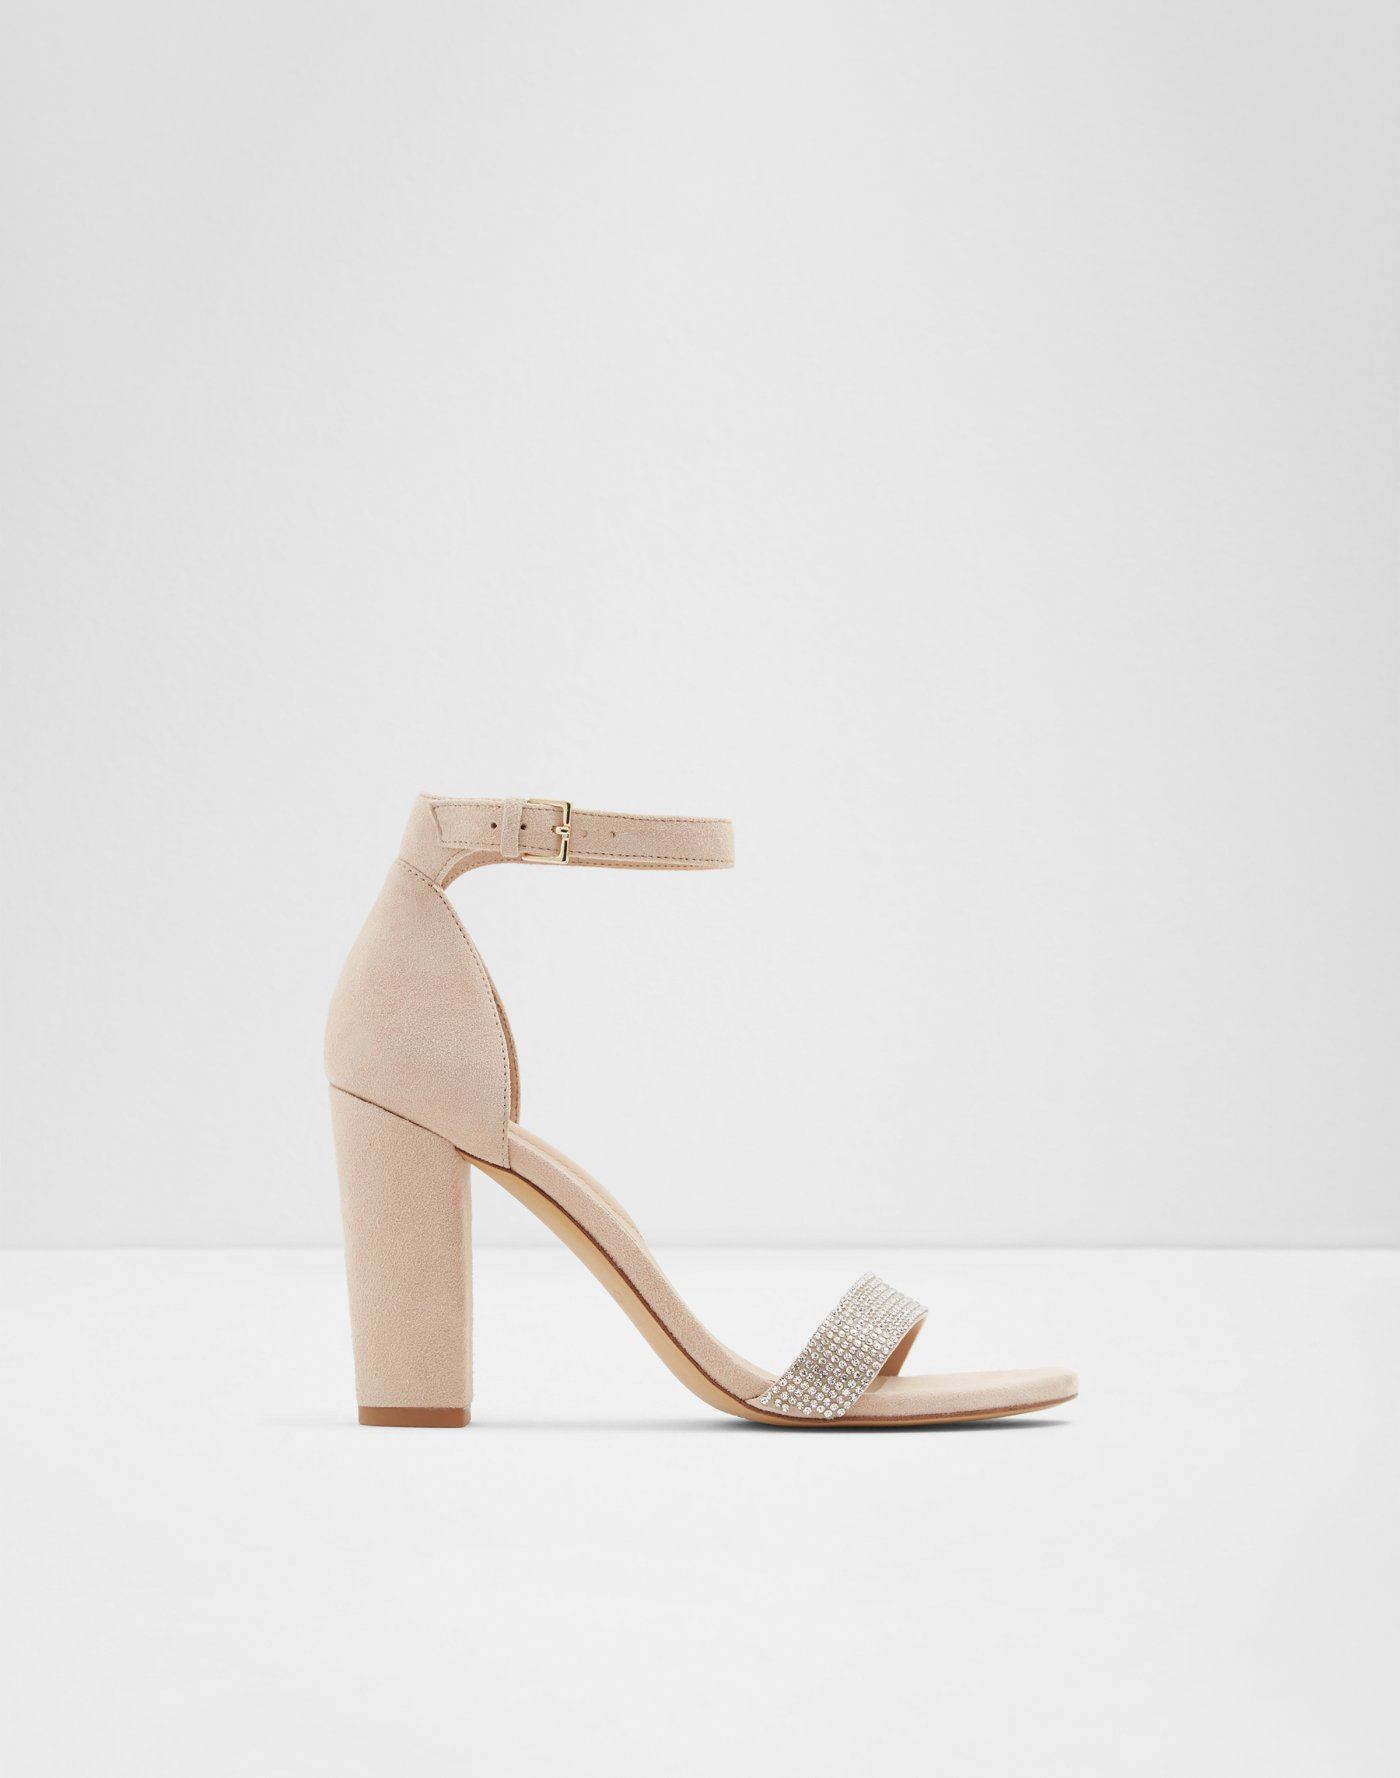 1e469f9528b7 Sandals for Women   Slides & Gladiator Sandals   ALDO US   Aldoshoes.com US